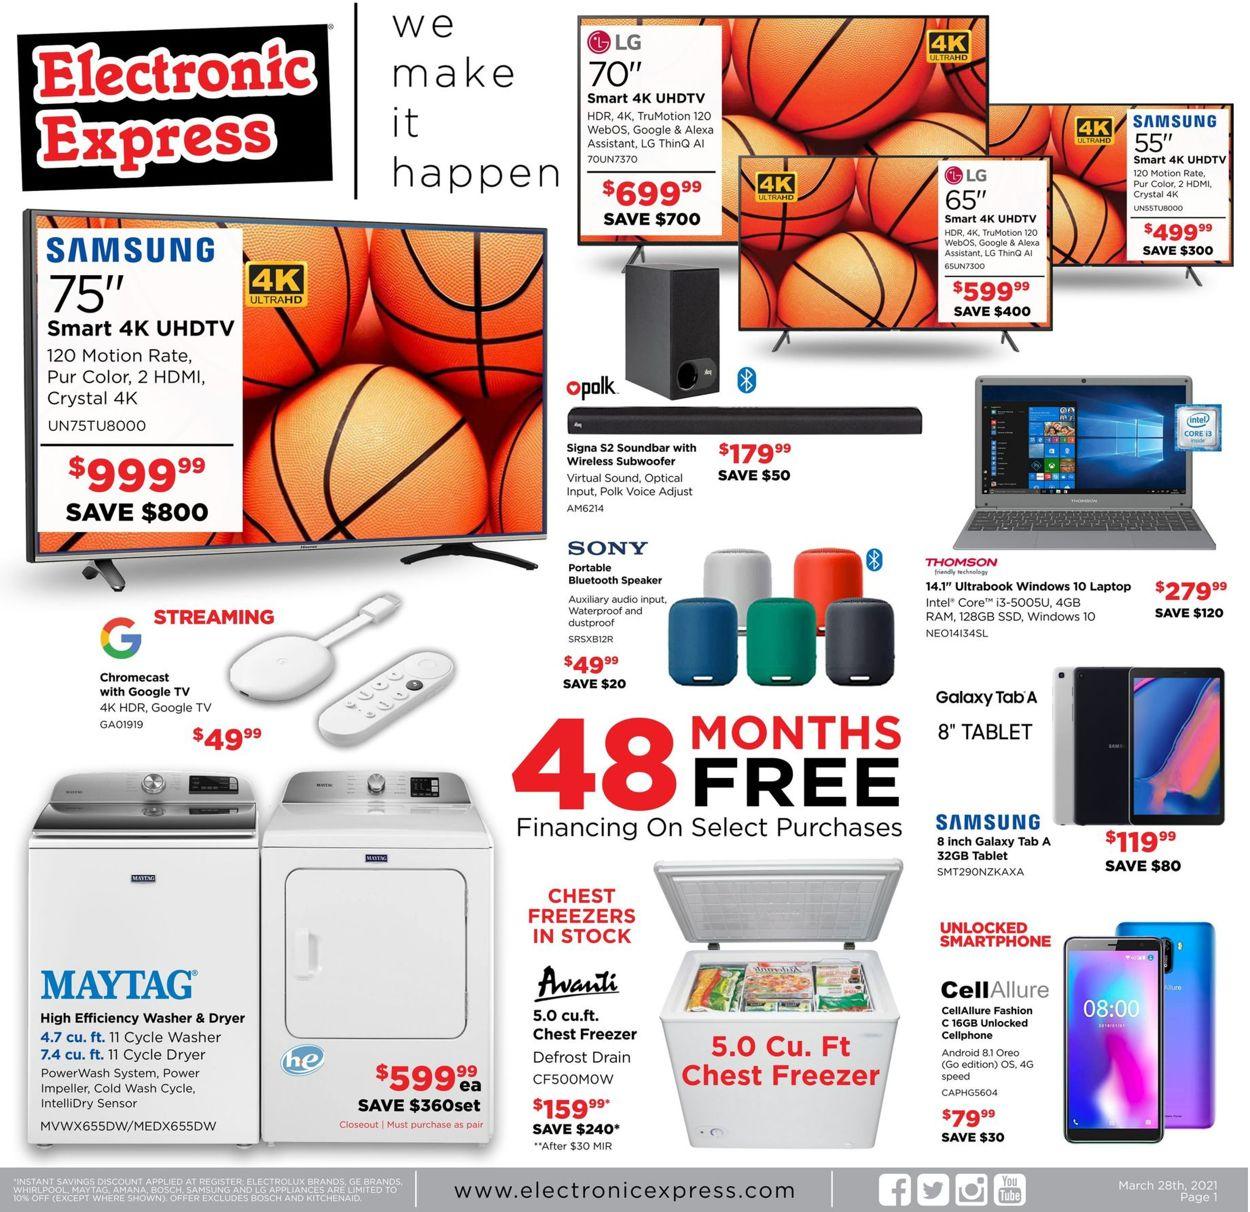 Electronic Express Weekly Ad Circular - valid 03/28-04/03/2021